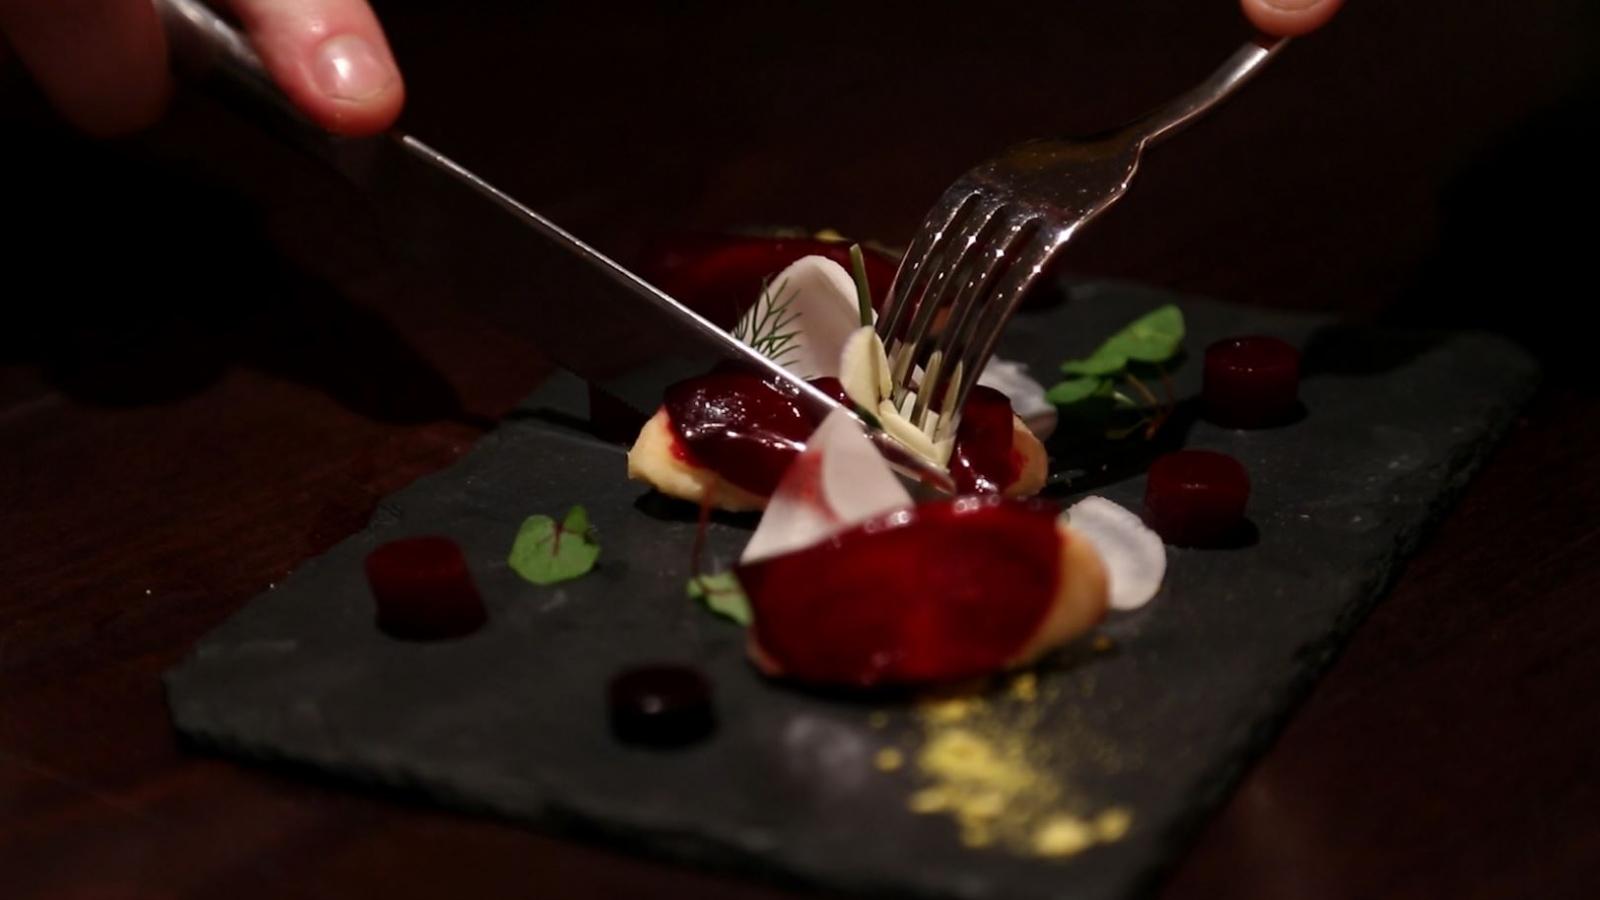 Paleo restaurant Pure Taste: How to fine dine in London on the \'Caveman diet\'